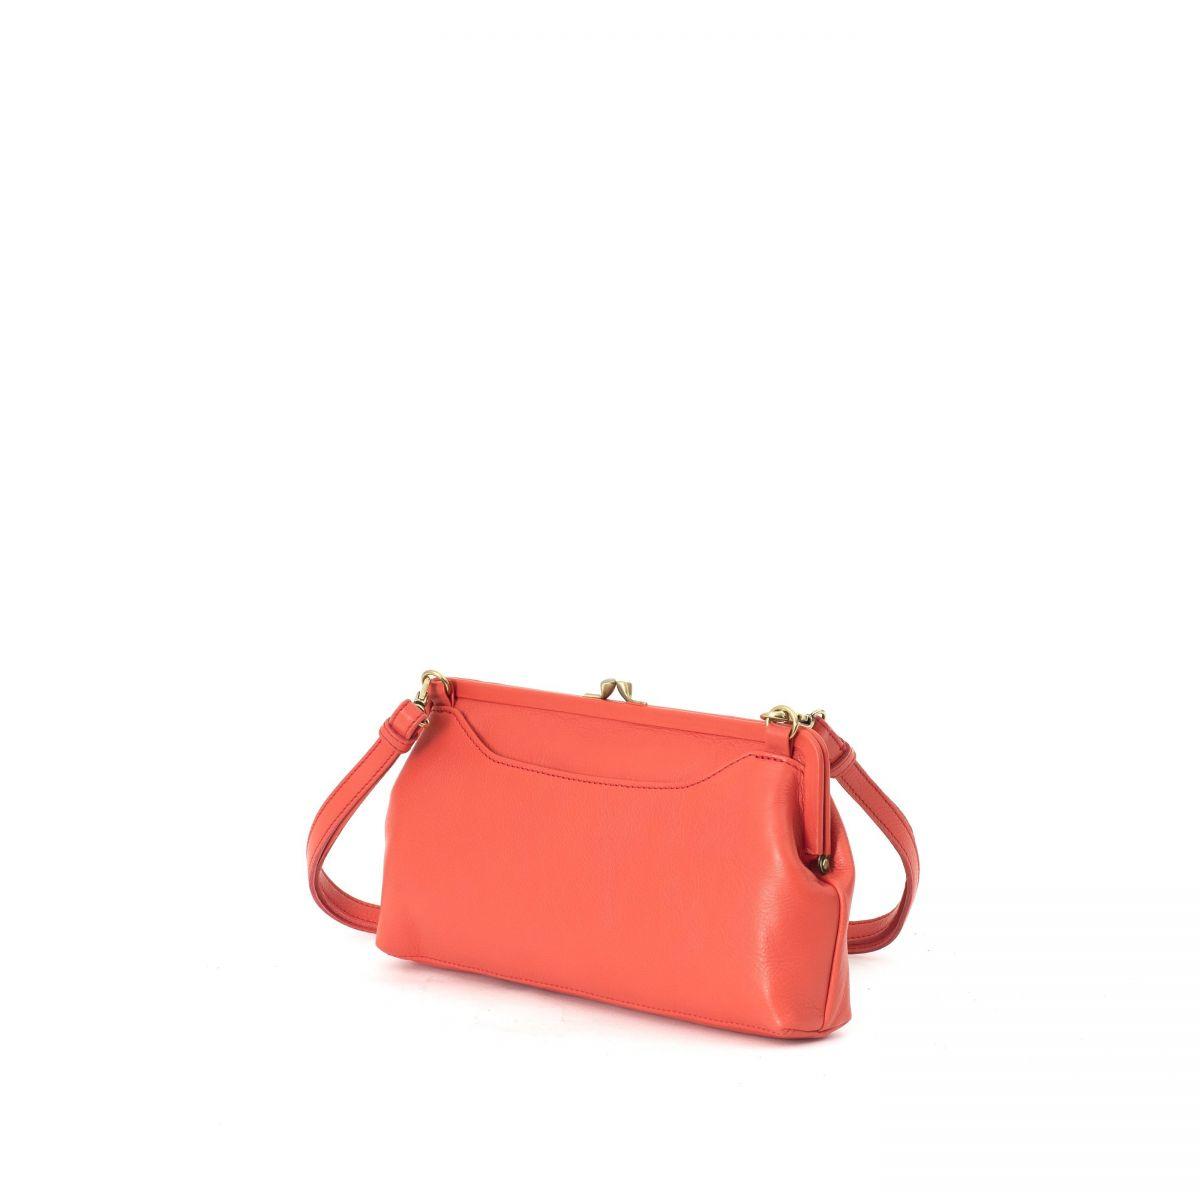 Women's Clutch Bag in Cowhide Leather BCL006 color Gazpacho   Details